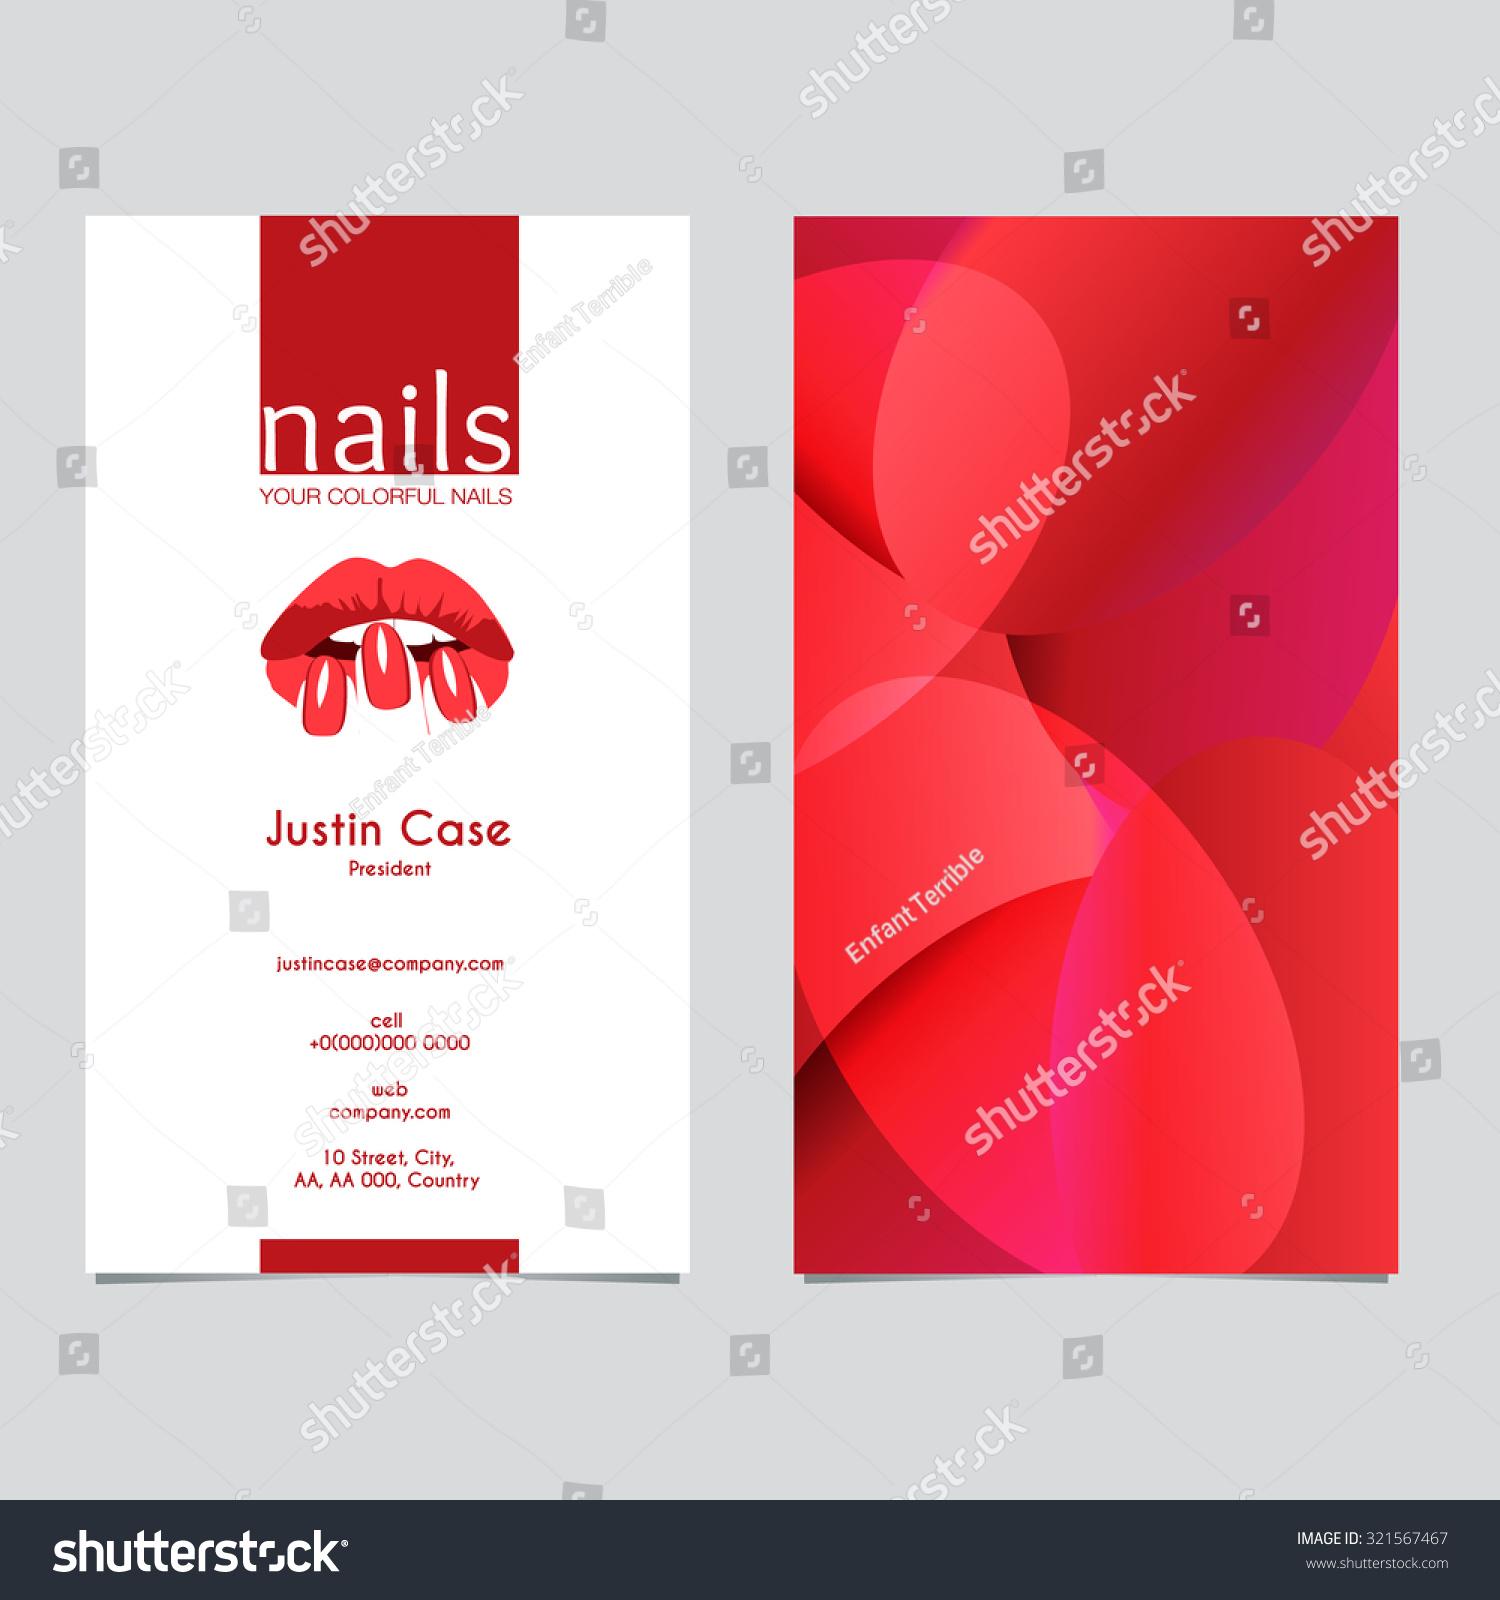 Nail salon business card template skiro pk i pro nail salon business card template flashek Gallery